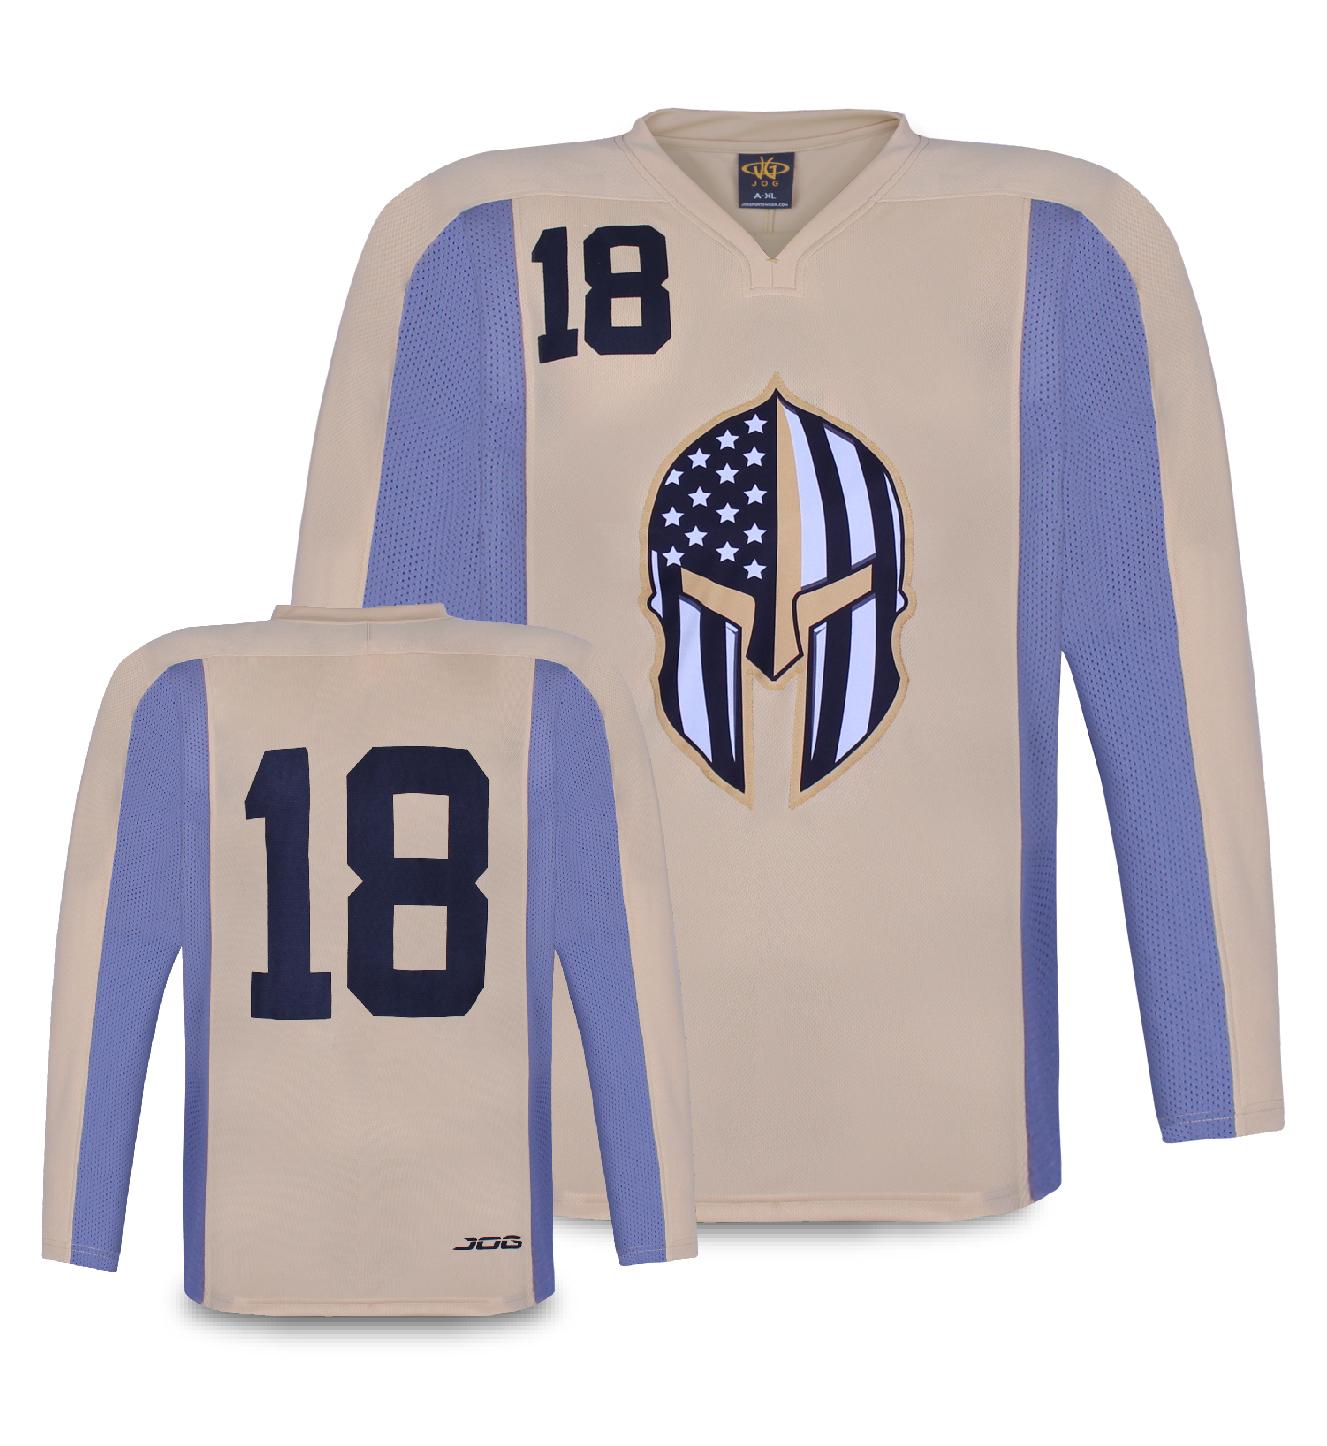 Custom hockey practice jersey.